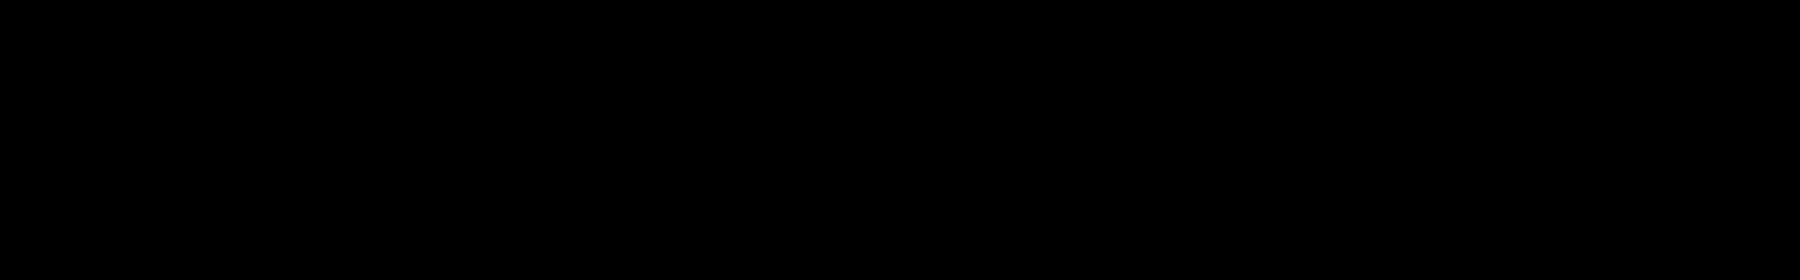 Projections - Psytrance audio waveform